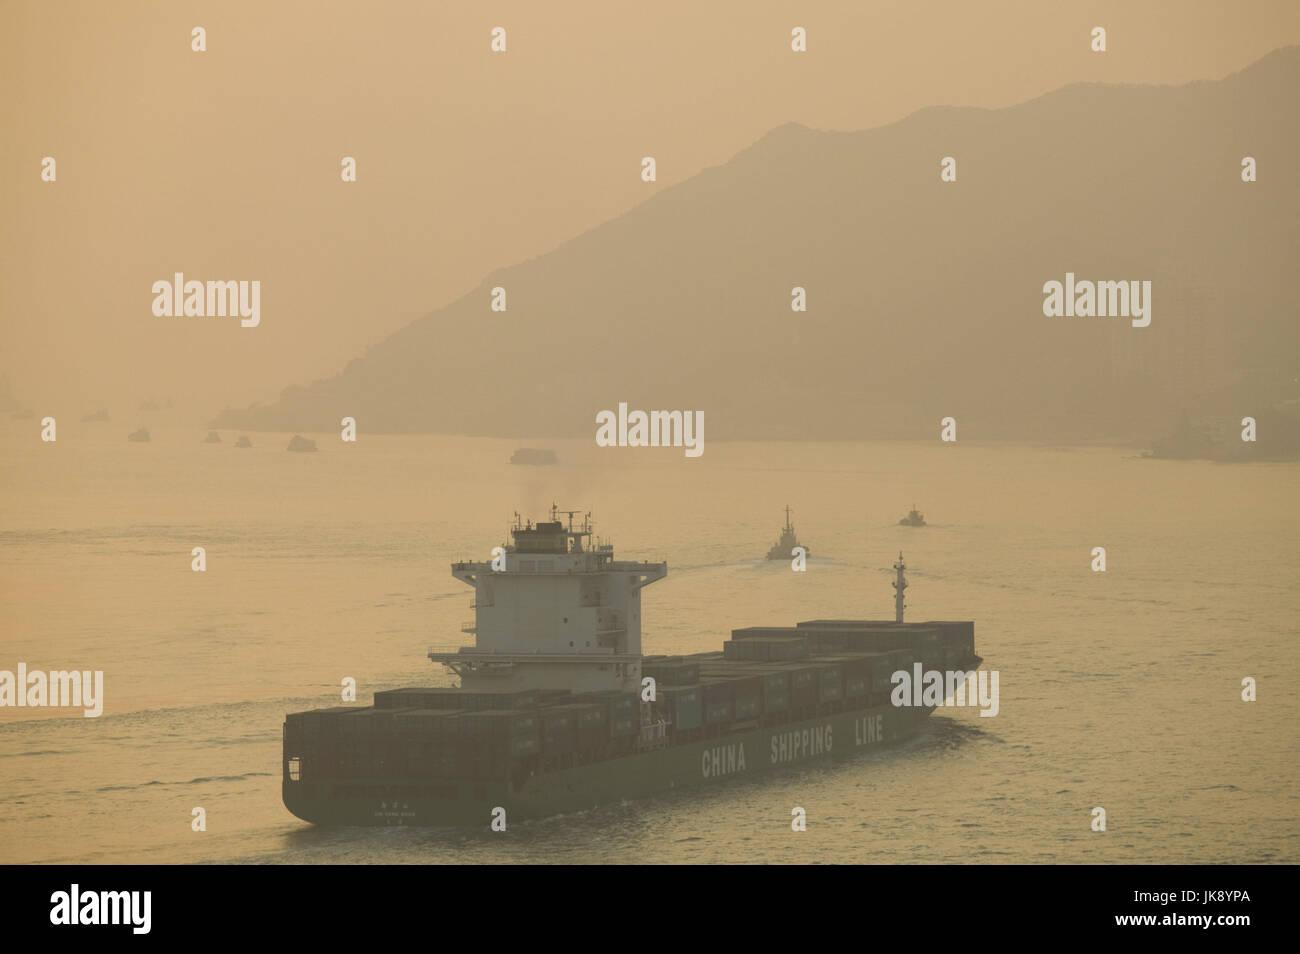 China, Hongkong, New Territories, Ma Wan Channel, Frachtschiff, Lantau Island, Abendstimmung, - Stock Image